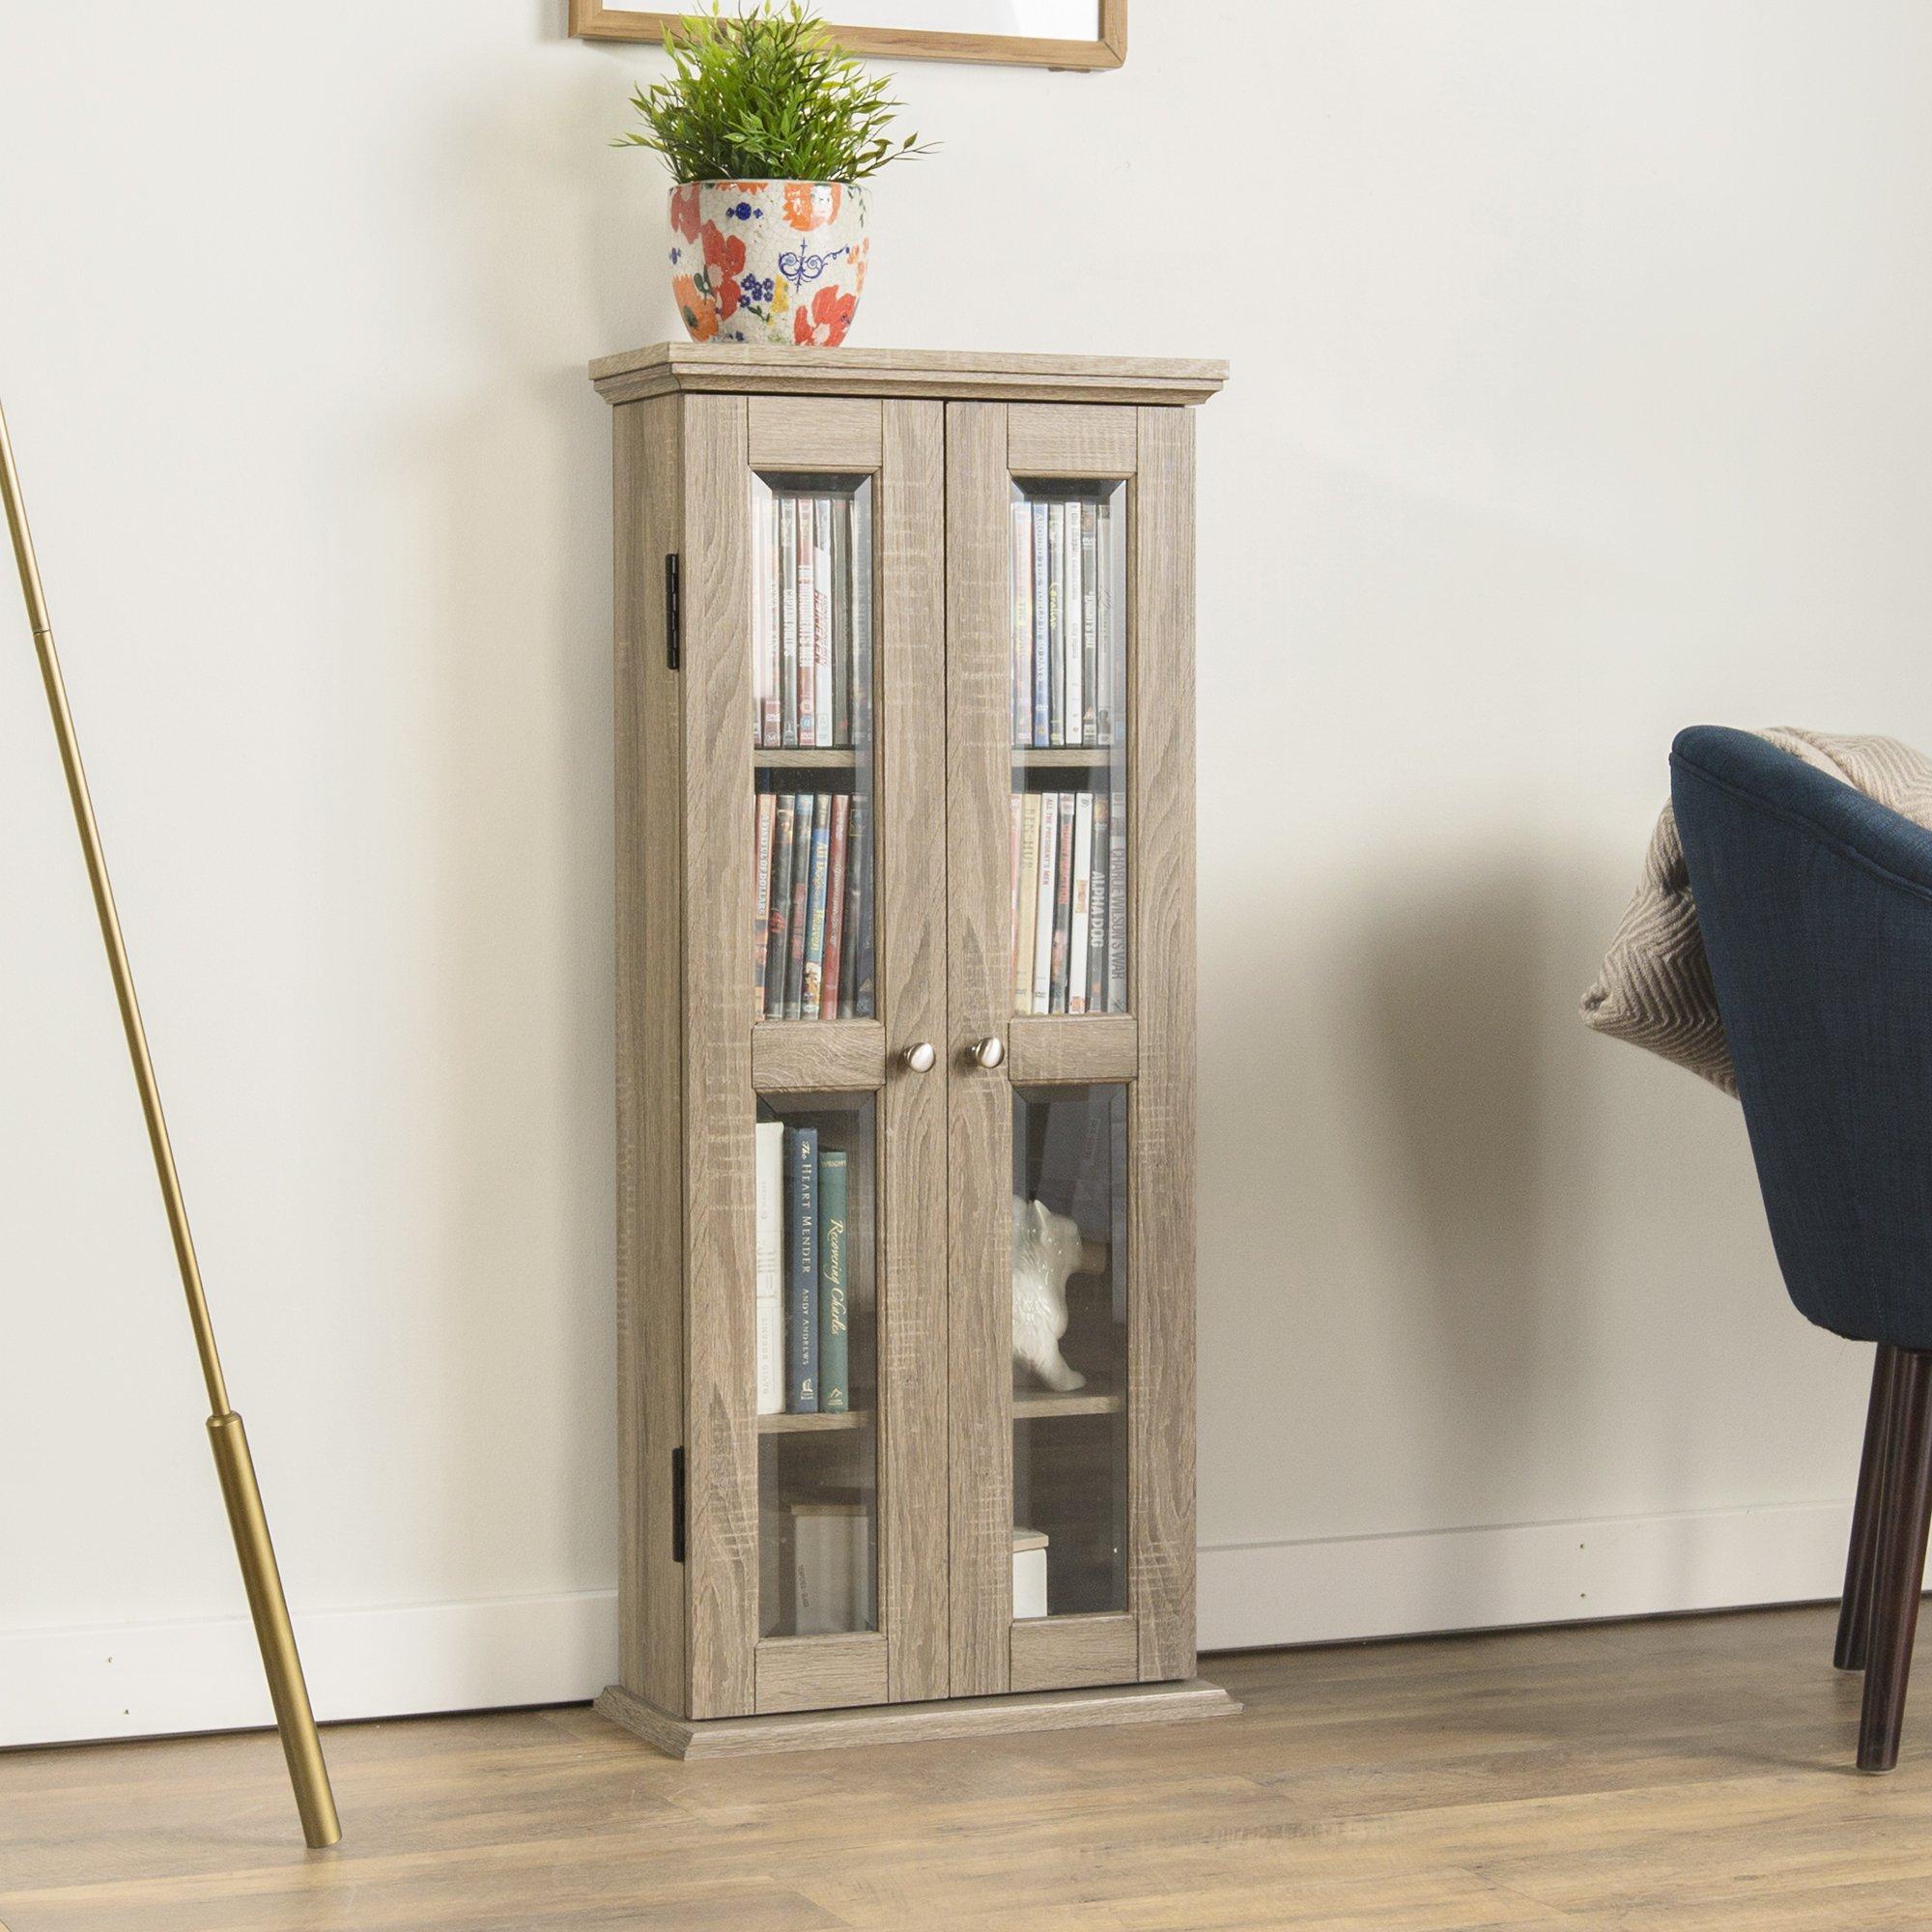 WE Furniture 41'' Wood Media Cabinet - Driftwood